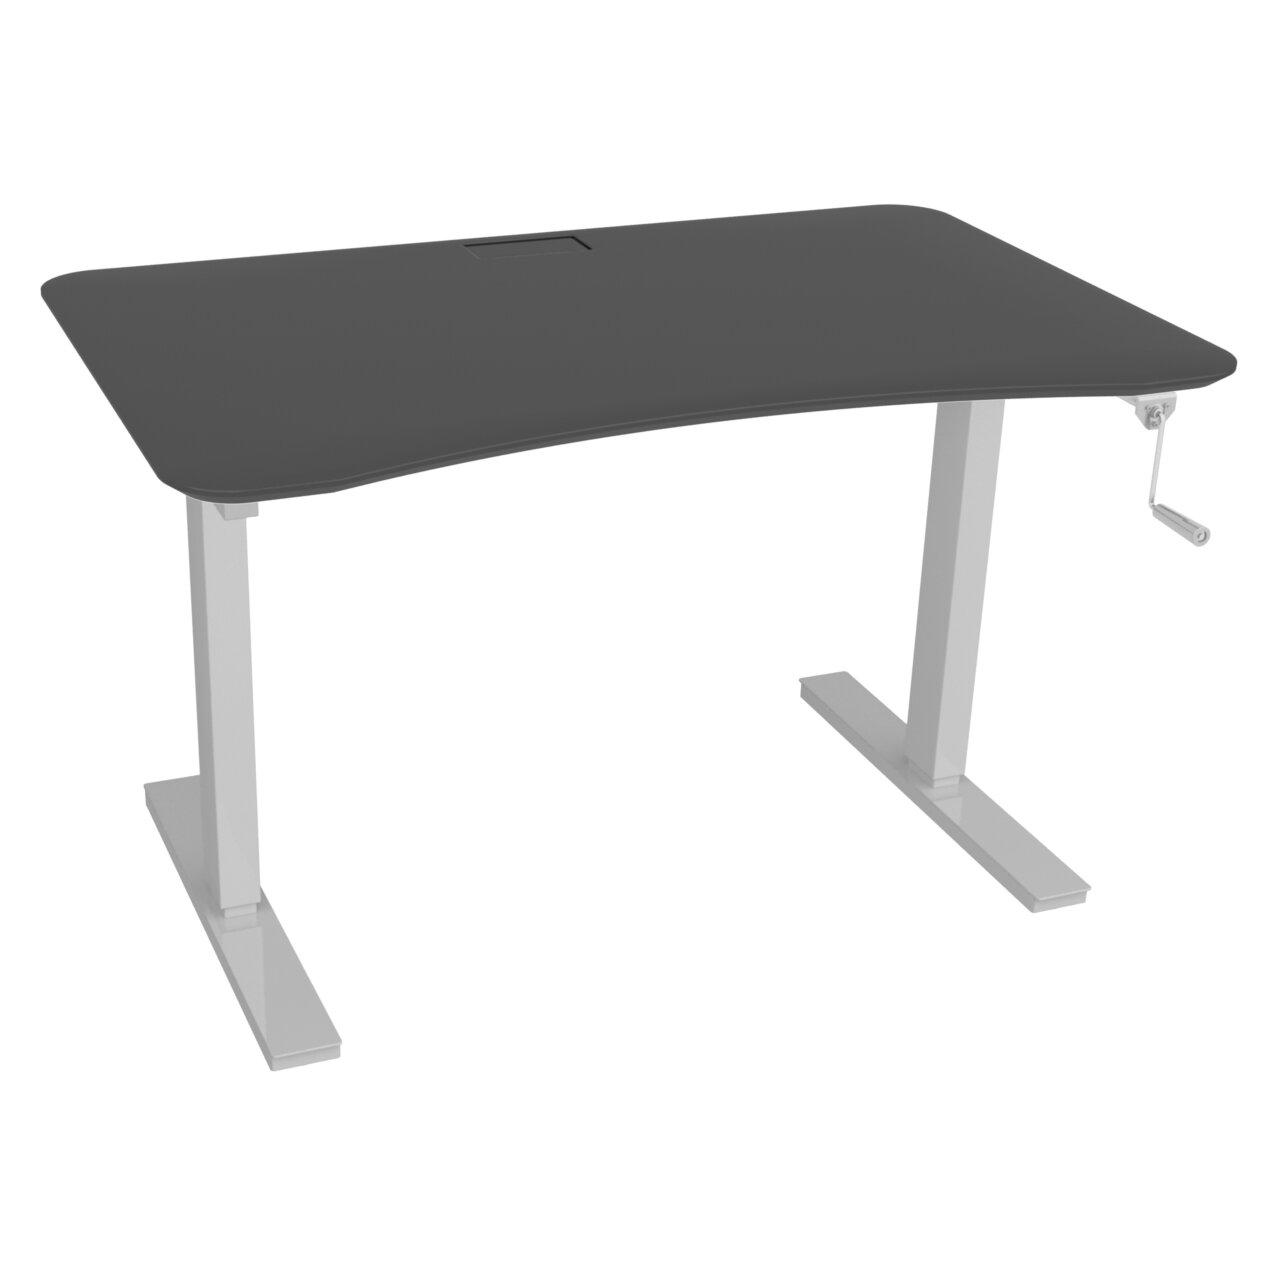 ee standing desk with manual hand crank wayfair. Black Bedroom Furniture Sets. Home Design Ideas